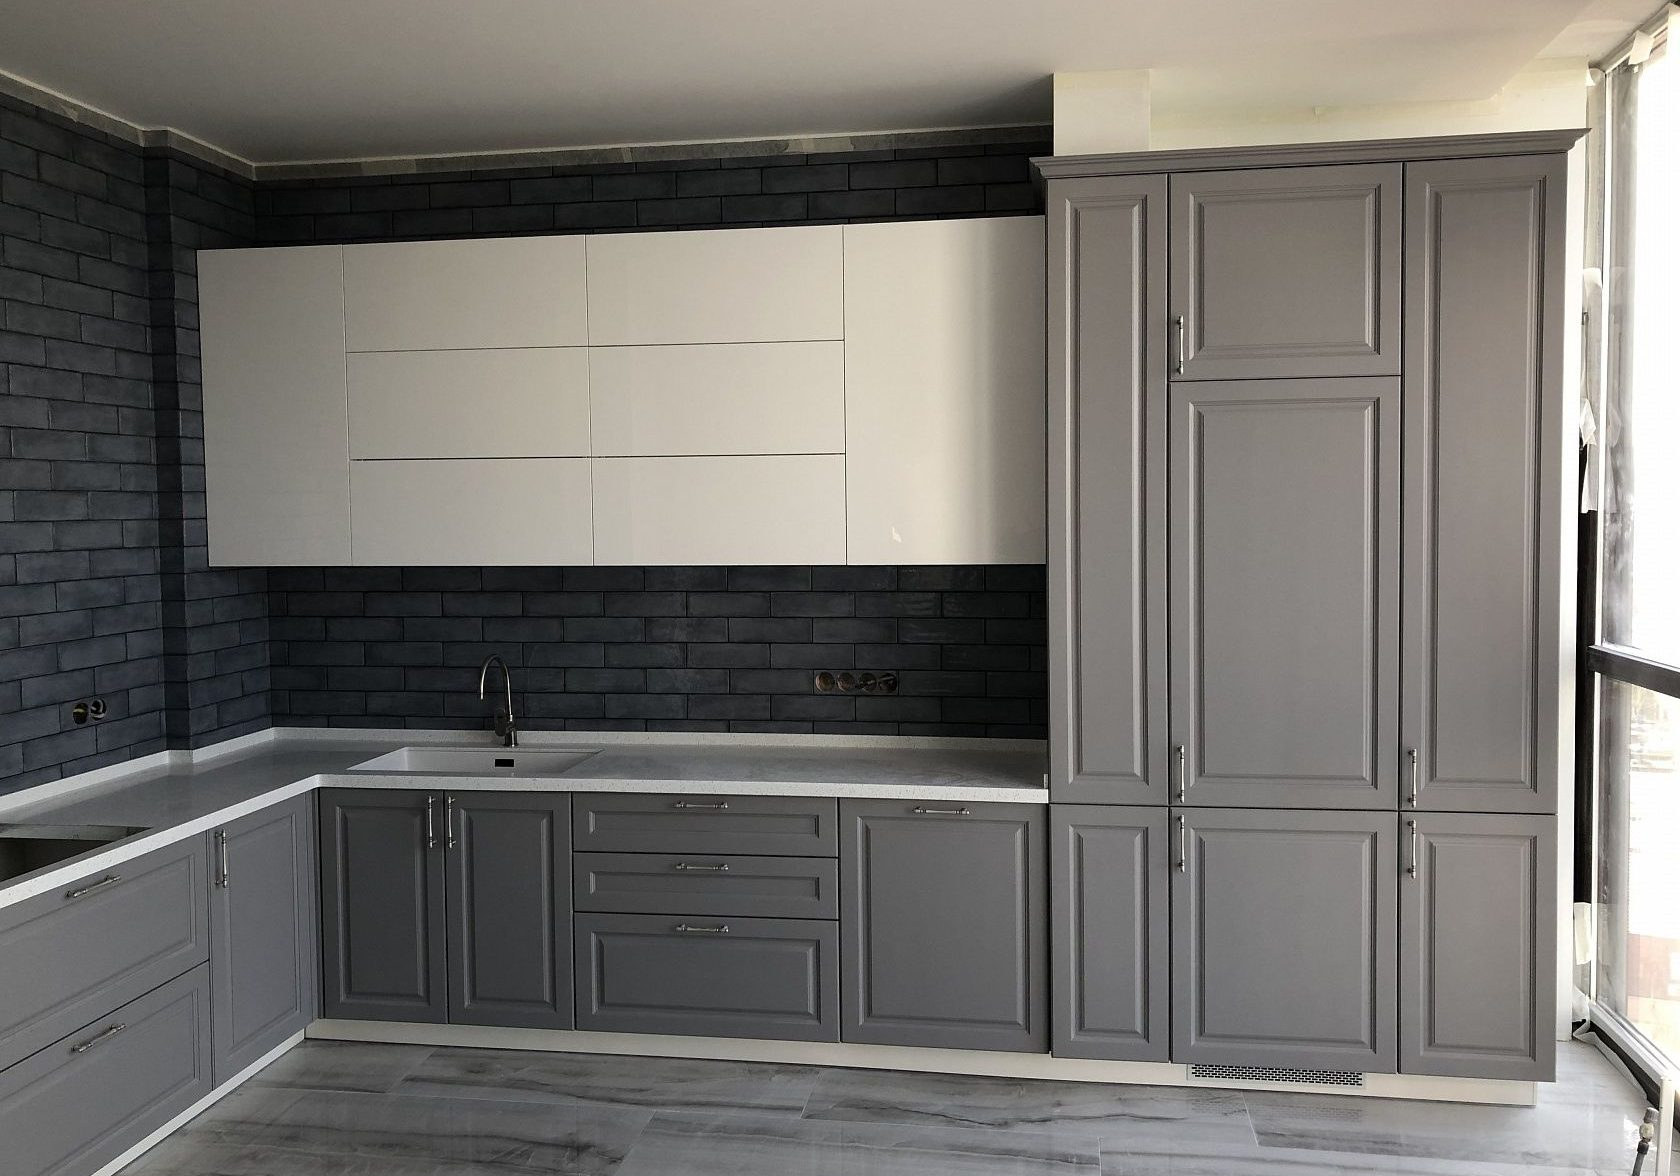 Крашенная кухня МДФ, серый низ, белый верх